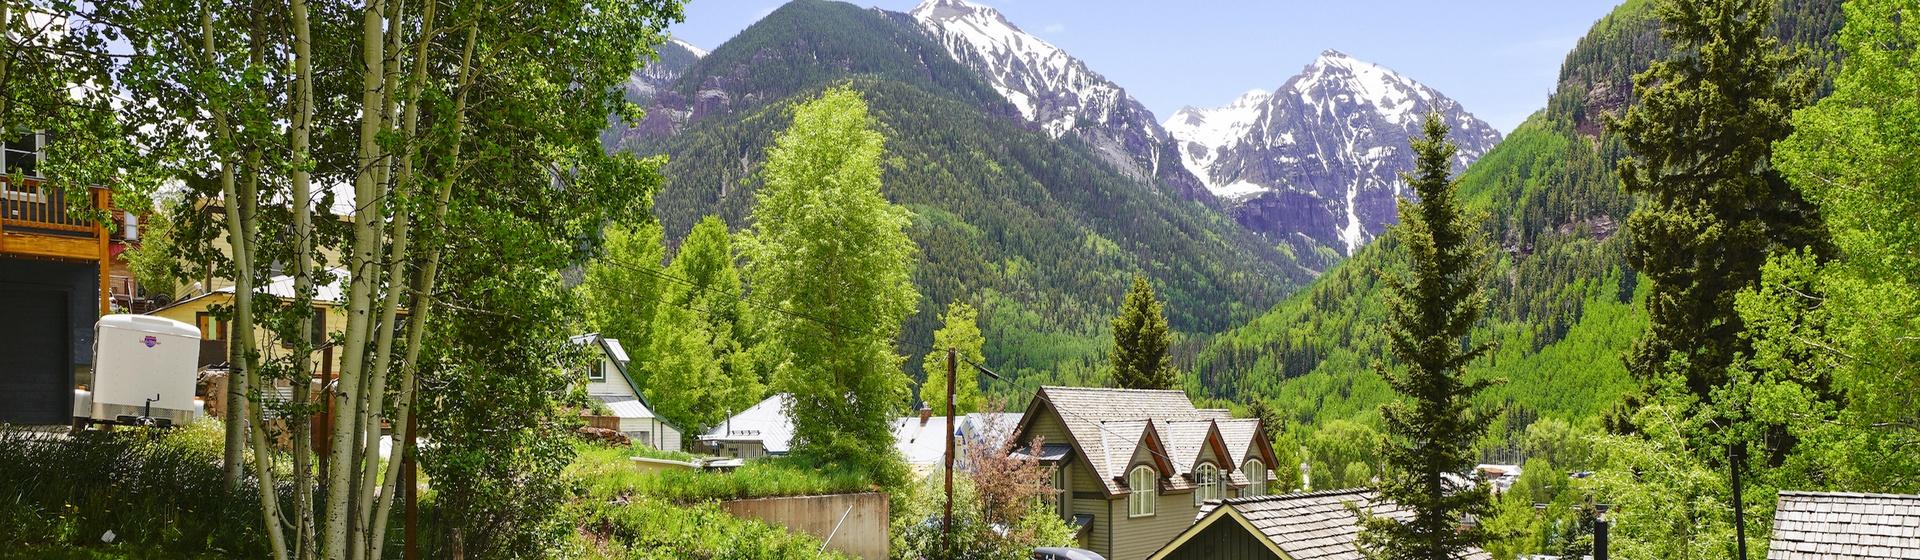 4.01-telluride-summer-haus-mountain-view-web.jpg